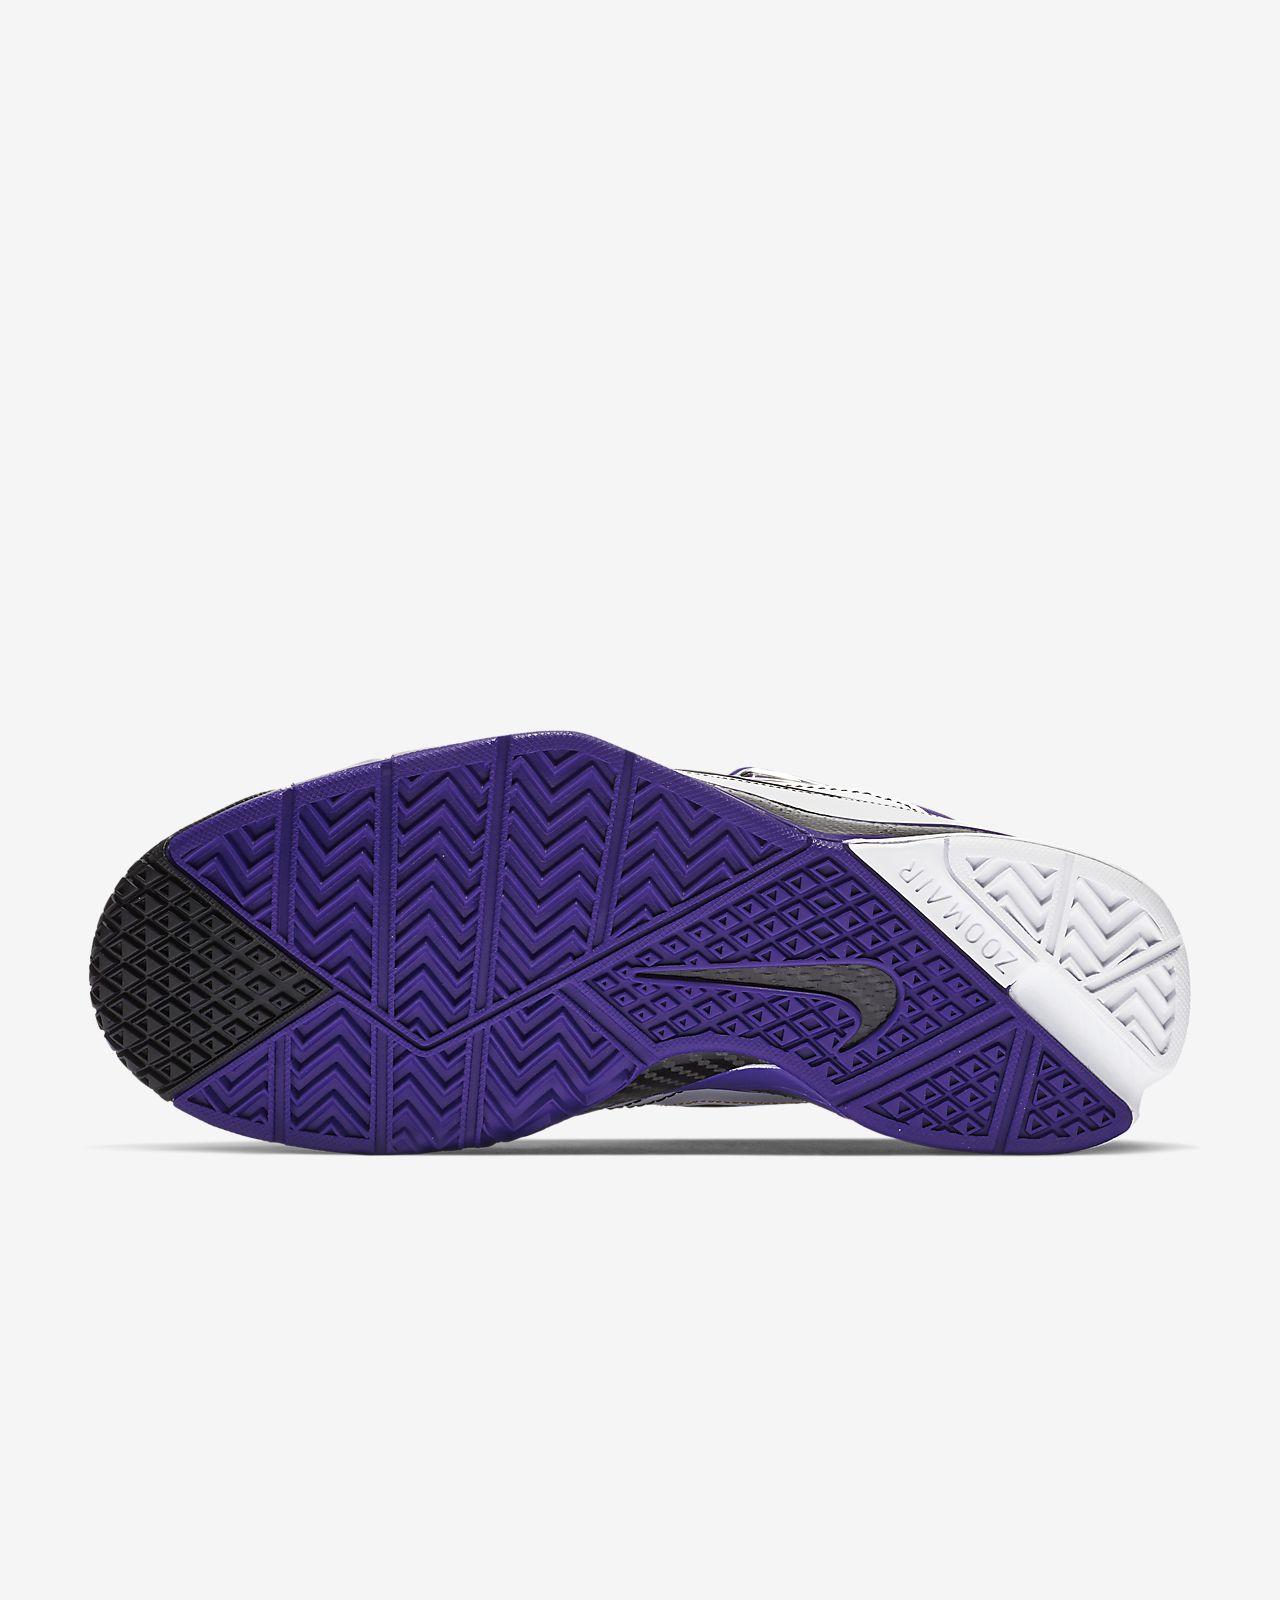 bf93057aeaee Kobe 1 Protro Basketball Shoe. Nike.com IN